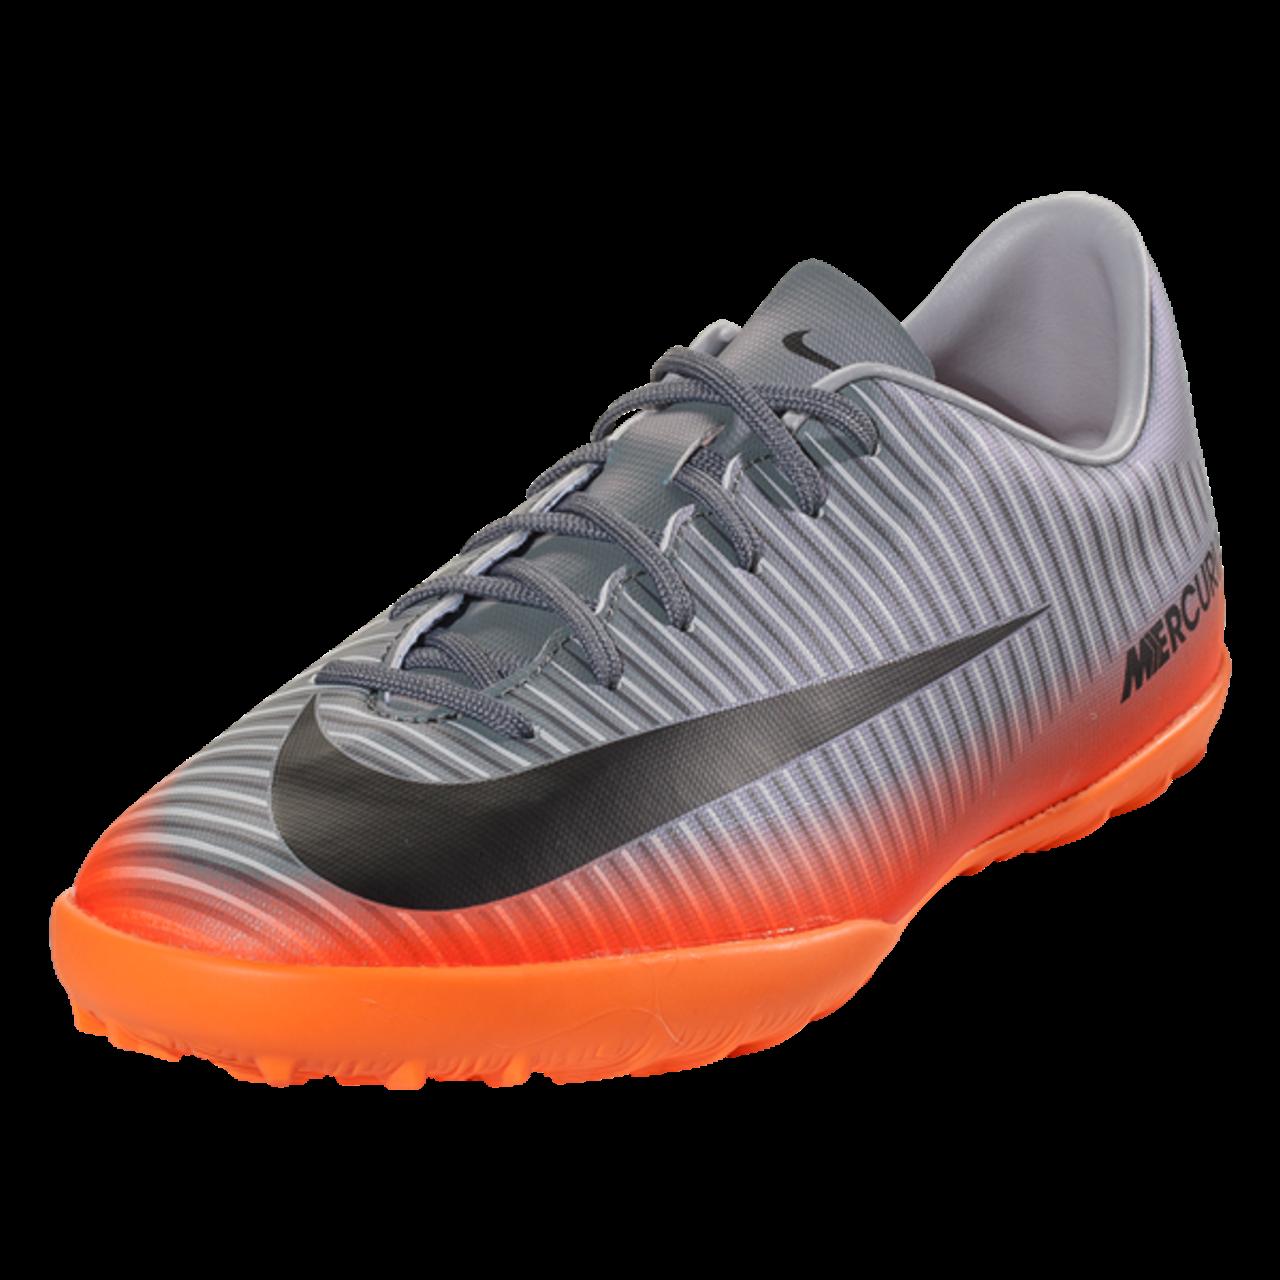 d587cf946 Nike Jr MercurialX Victory 6 CR7 TF - Cool Grey/Metallic Hematite/Total  Orange (5117) - ohp soccer